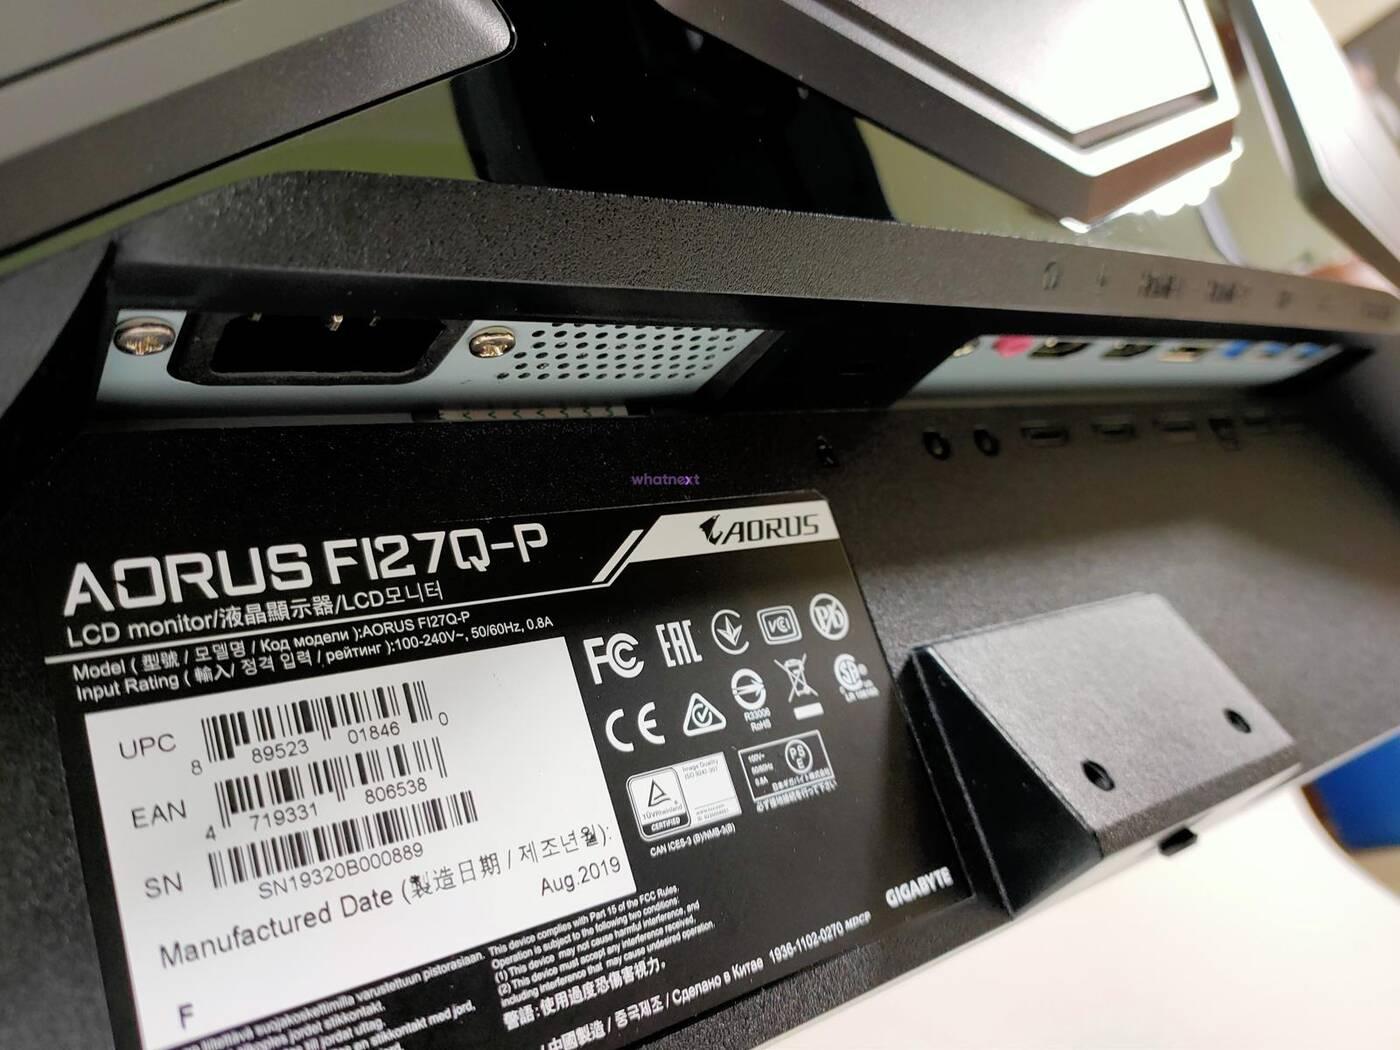 test Aorus F127Q-P, recenzja Aorus F127Q-P, review Aorus F127Q-P, opinia Aorus F127Q-P